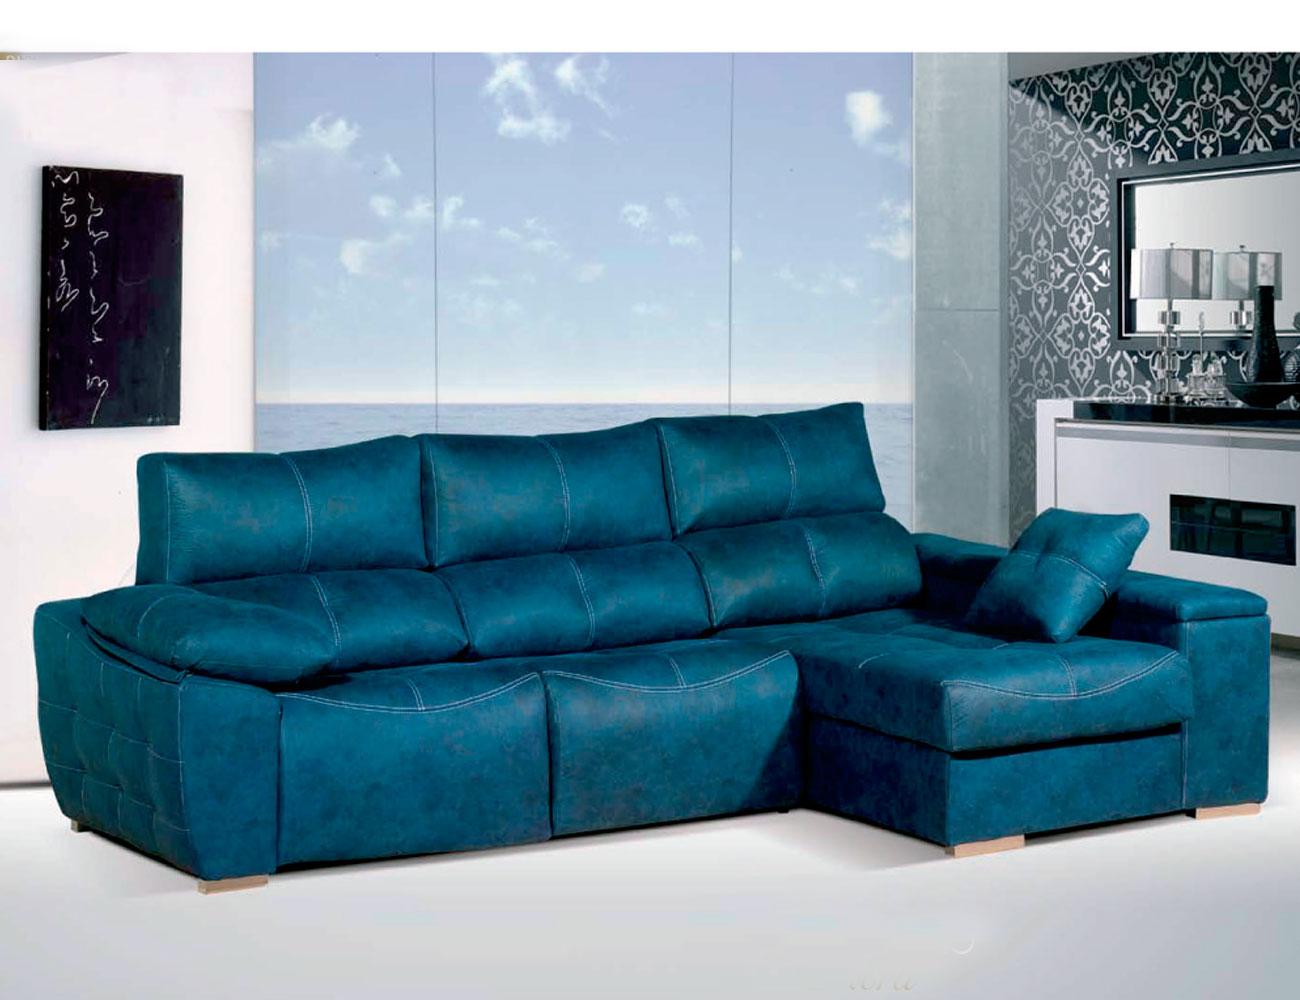 Sofa chaiselongue relax 2 motores anti manchas turquesa54